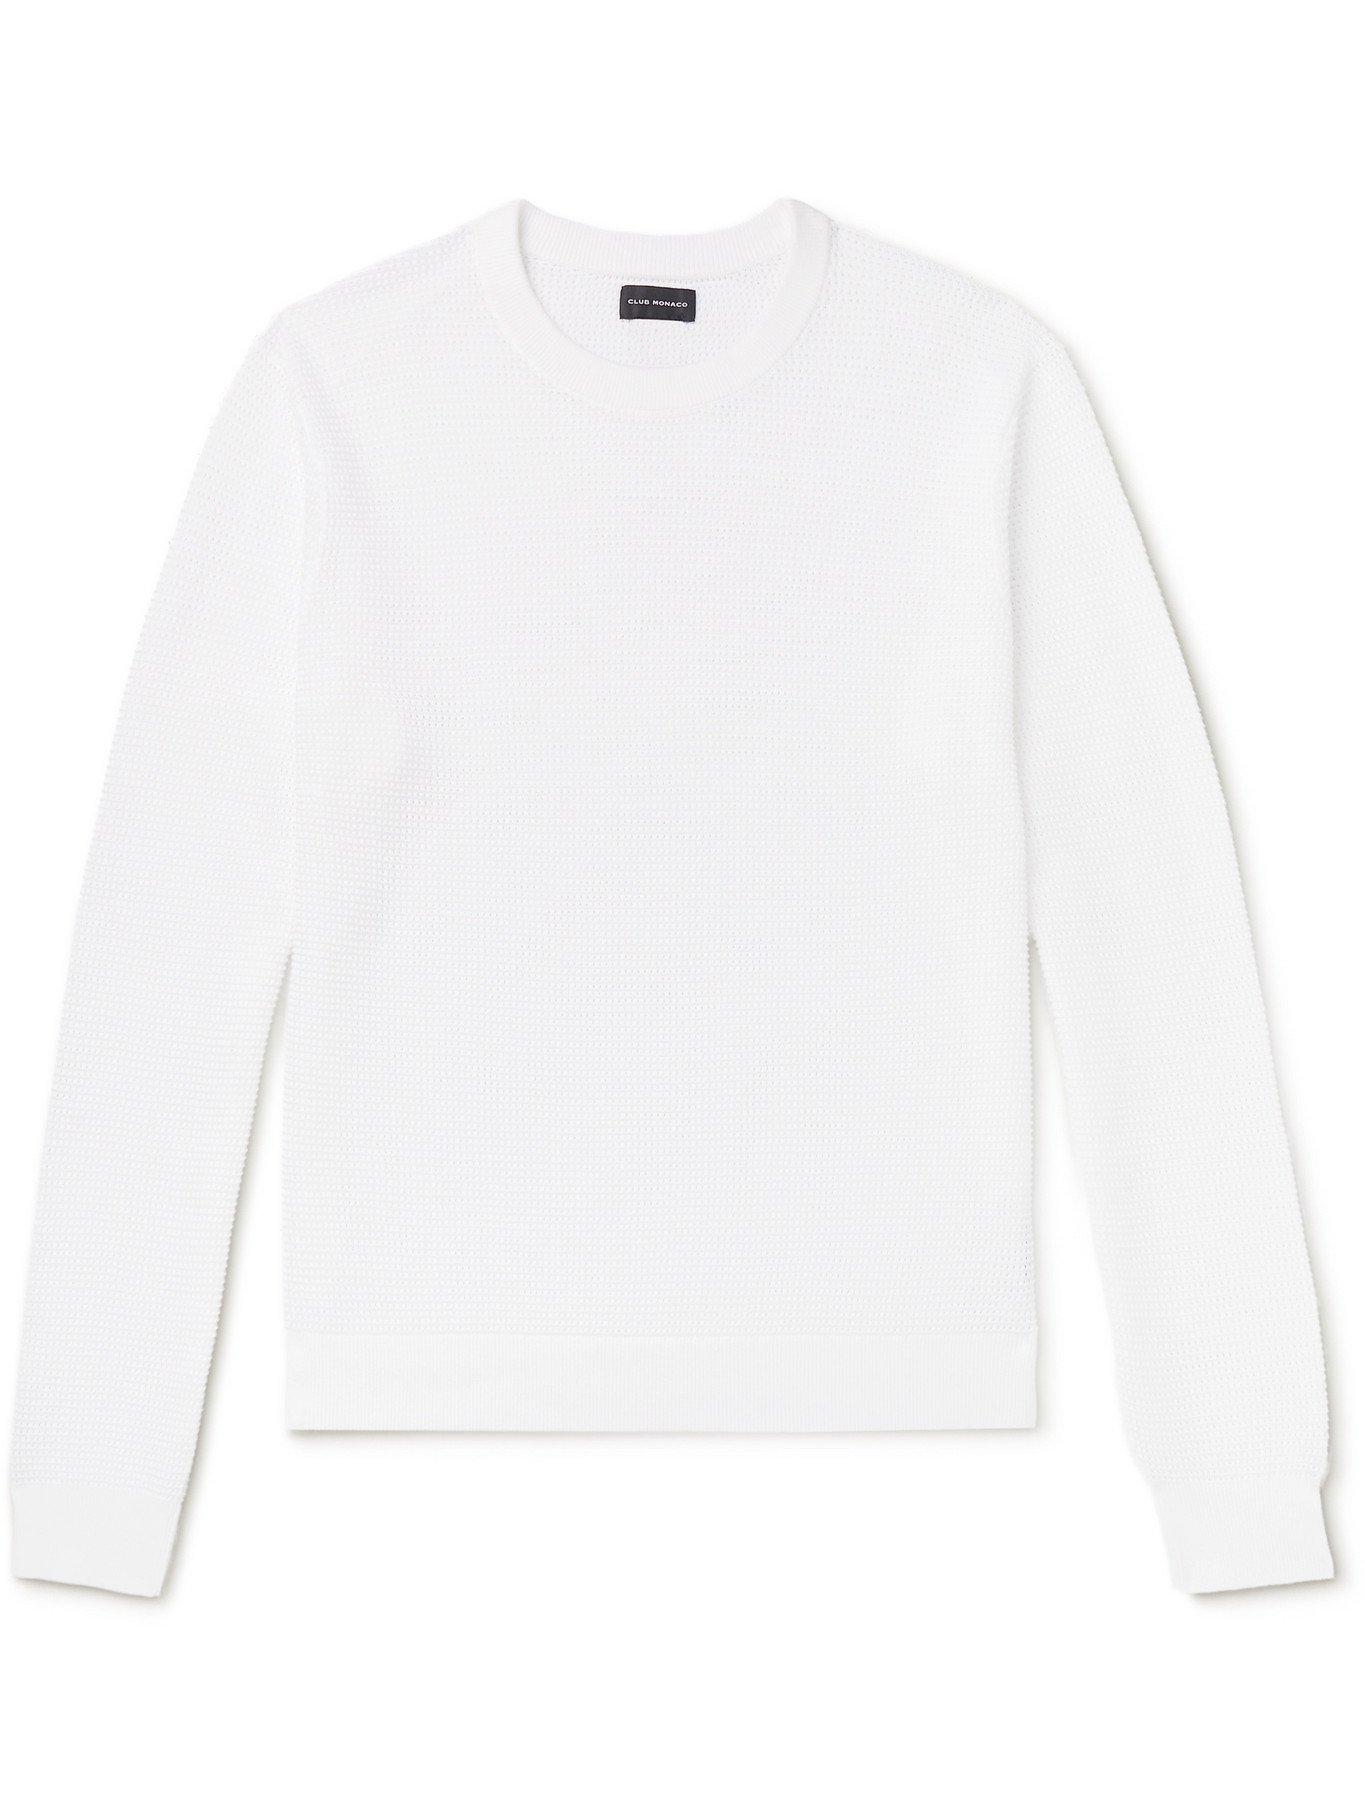 Photo: CLUB MONACO - Open-Knit Cotton Sweater - White - S